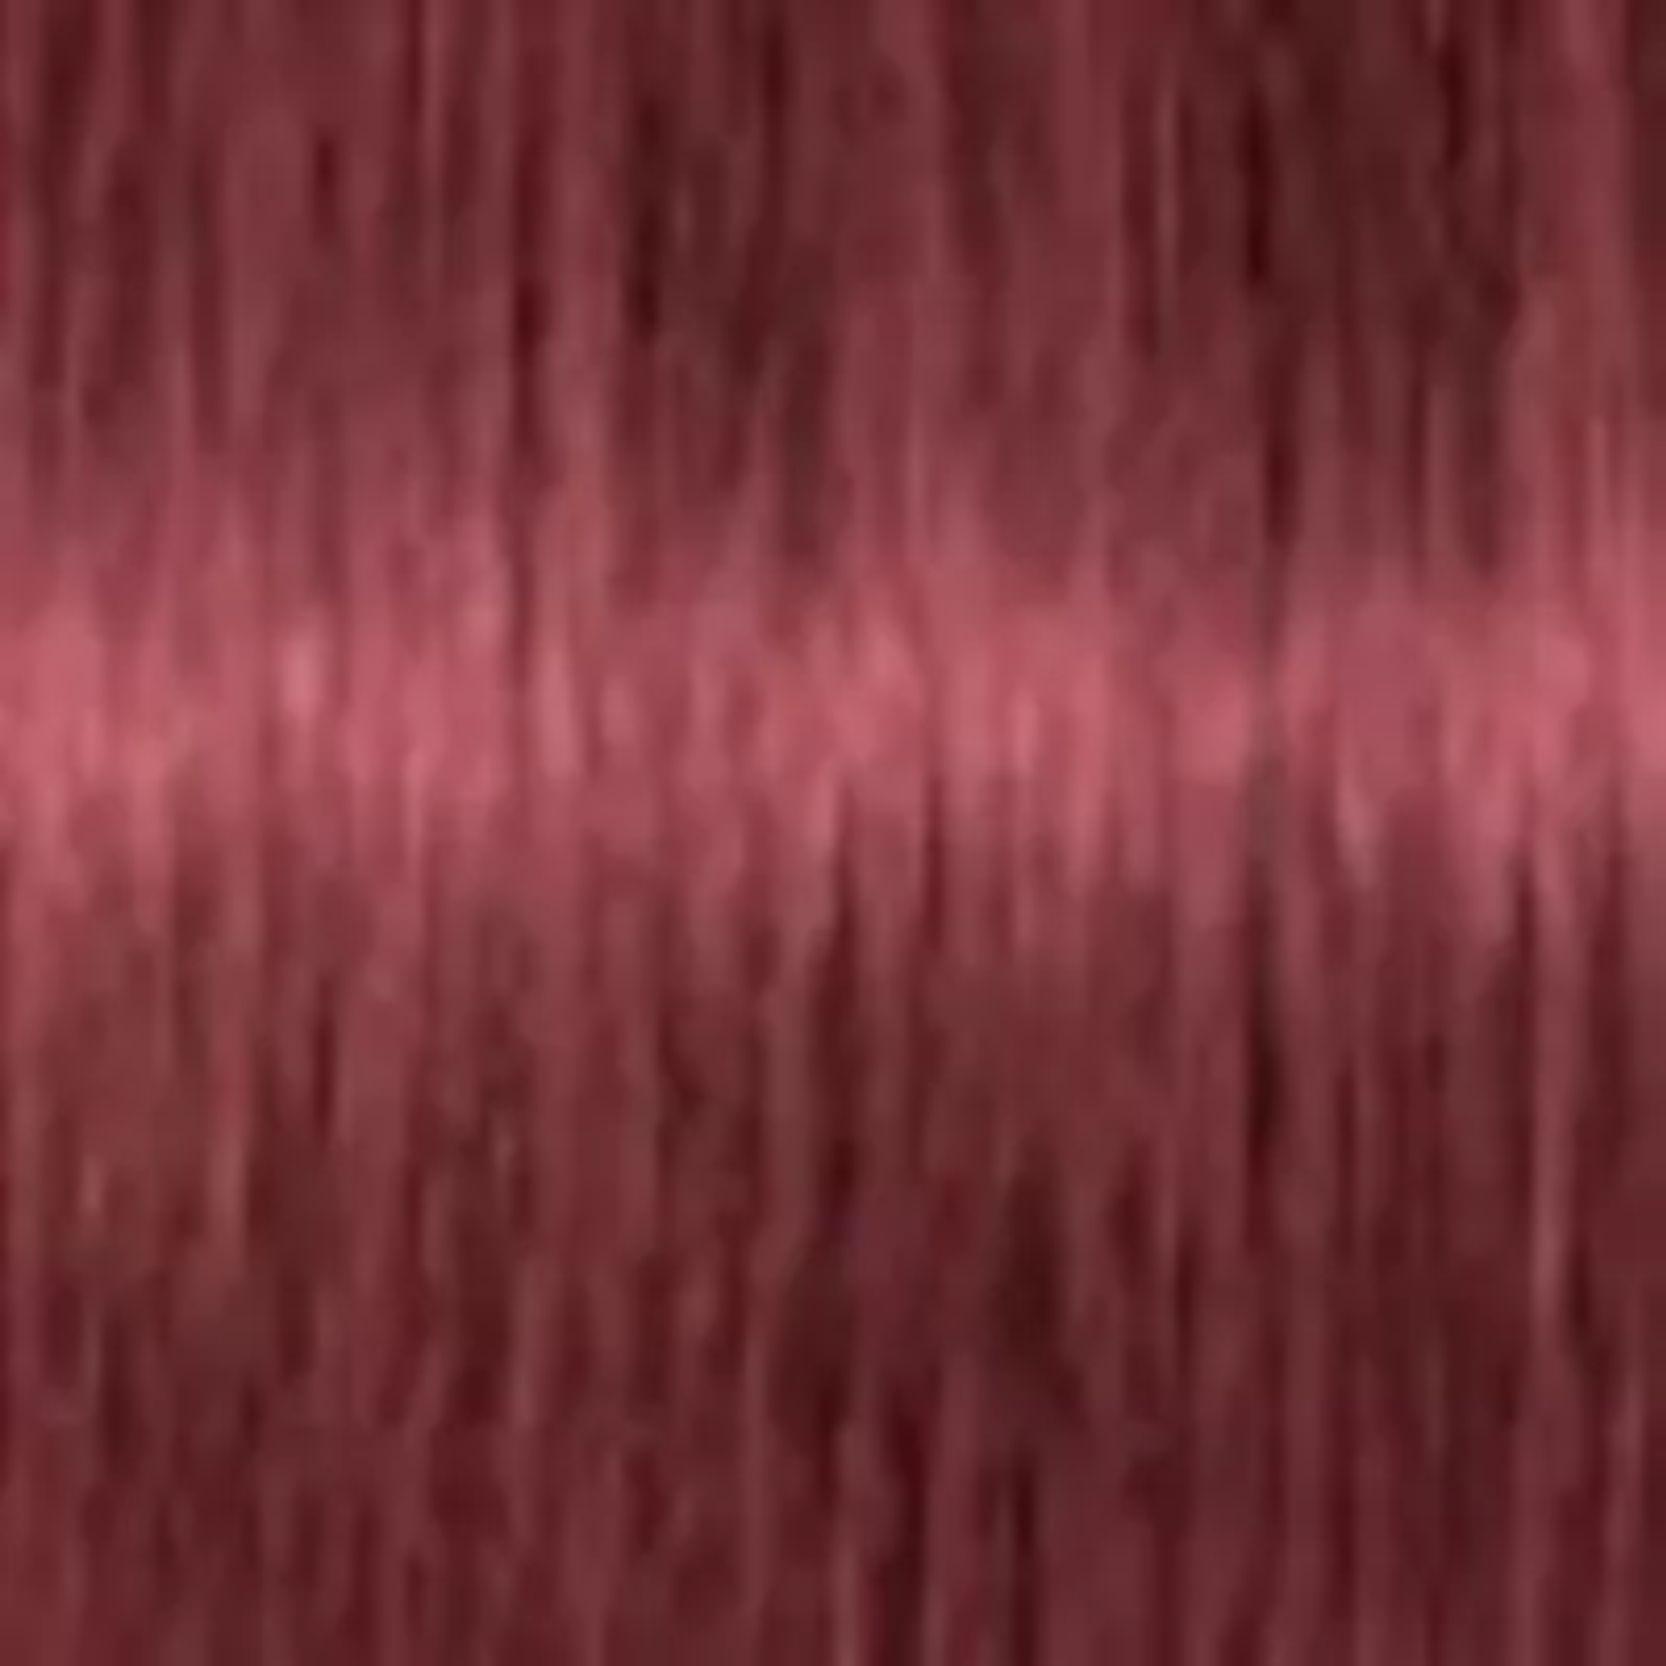 Tinta Igora Royal 60g - Cor 6.88 - Louro Escuro Vermelho Extra